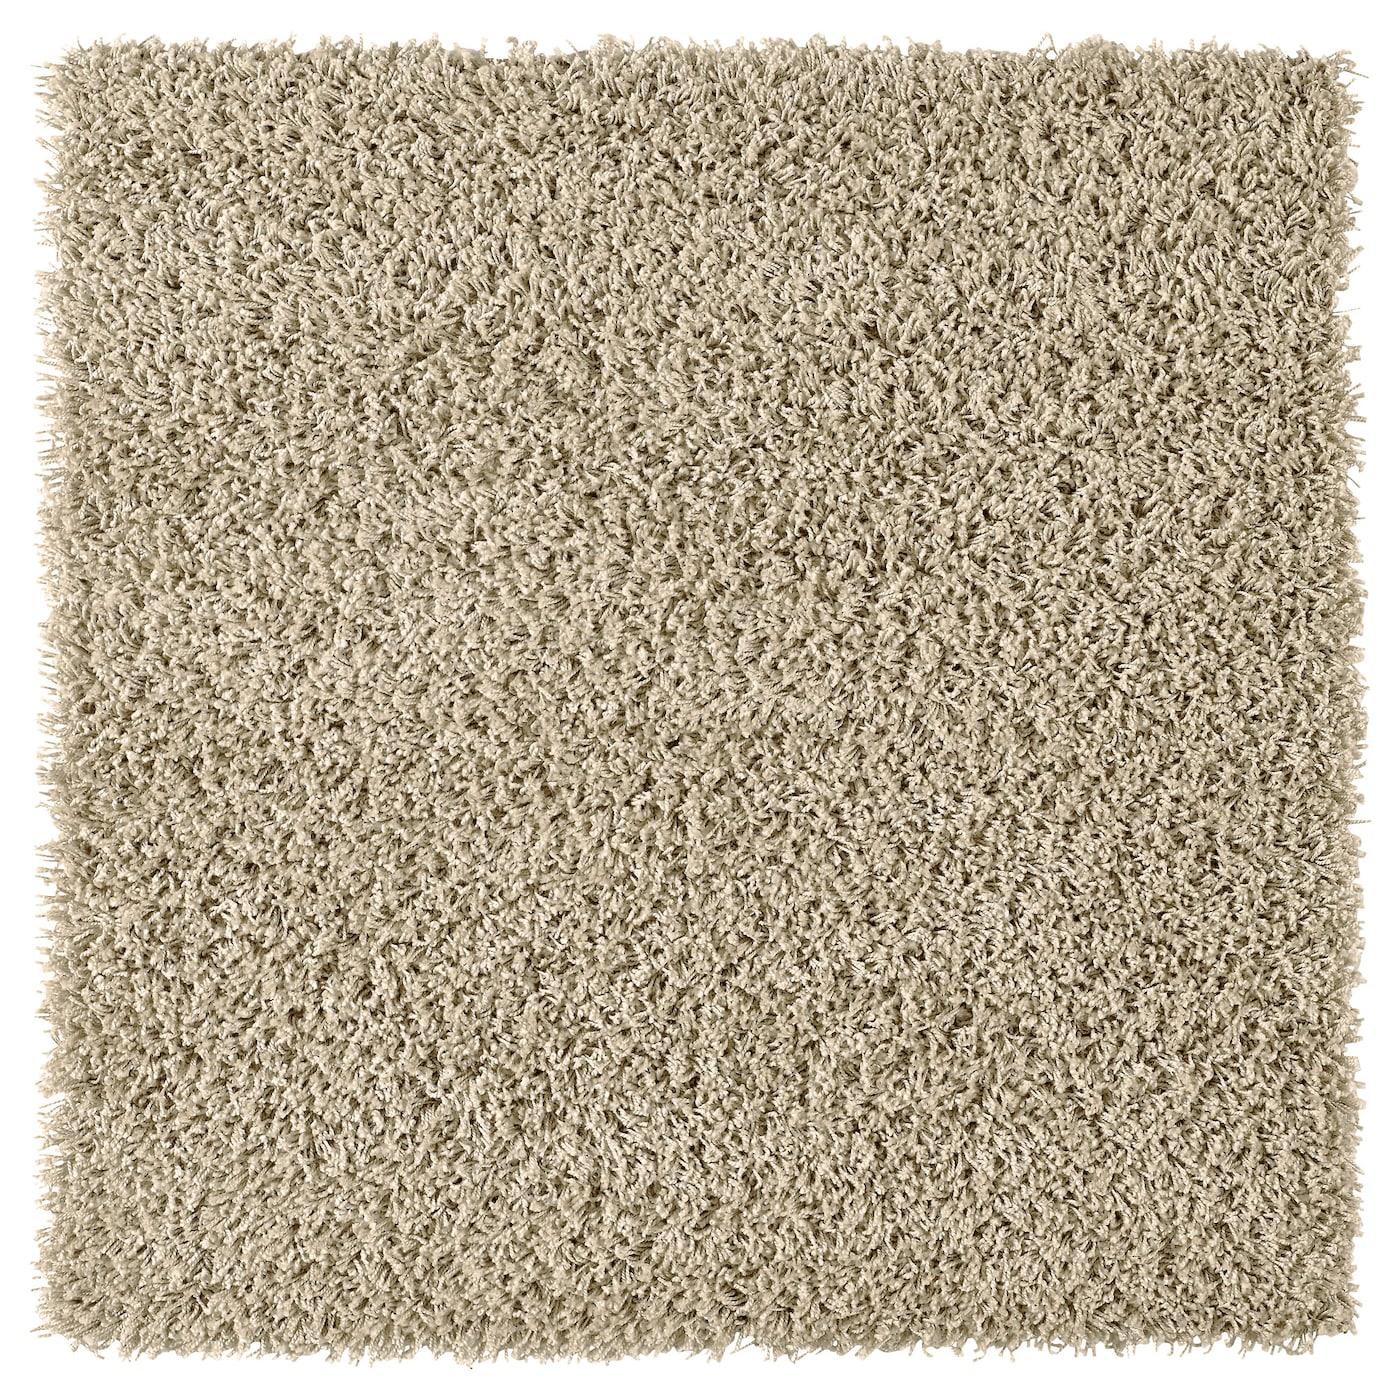 Alfombras textil para el hogar compra online ikea - Ikea tappeti pelo corto ...